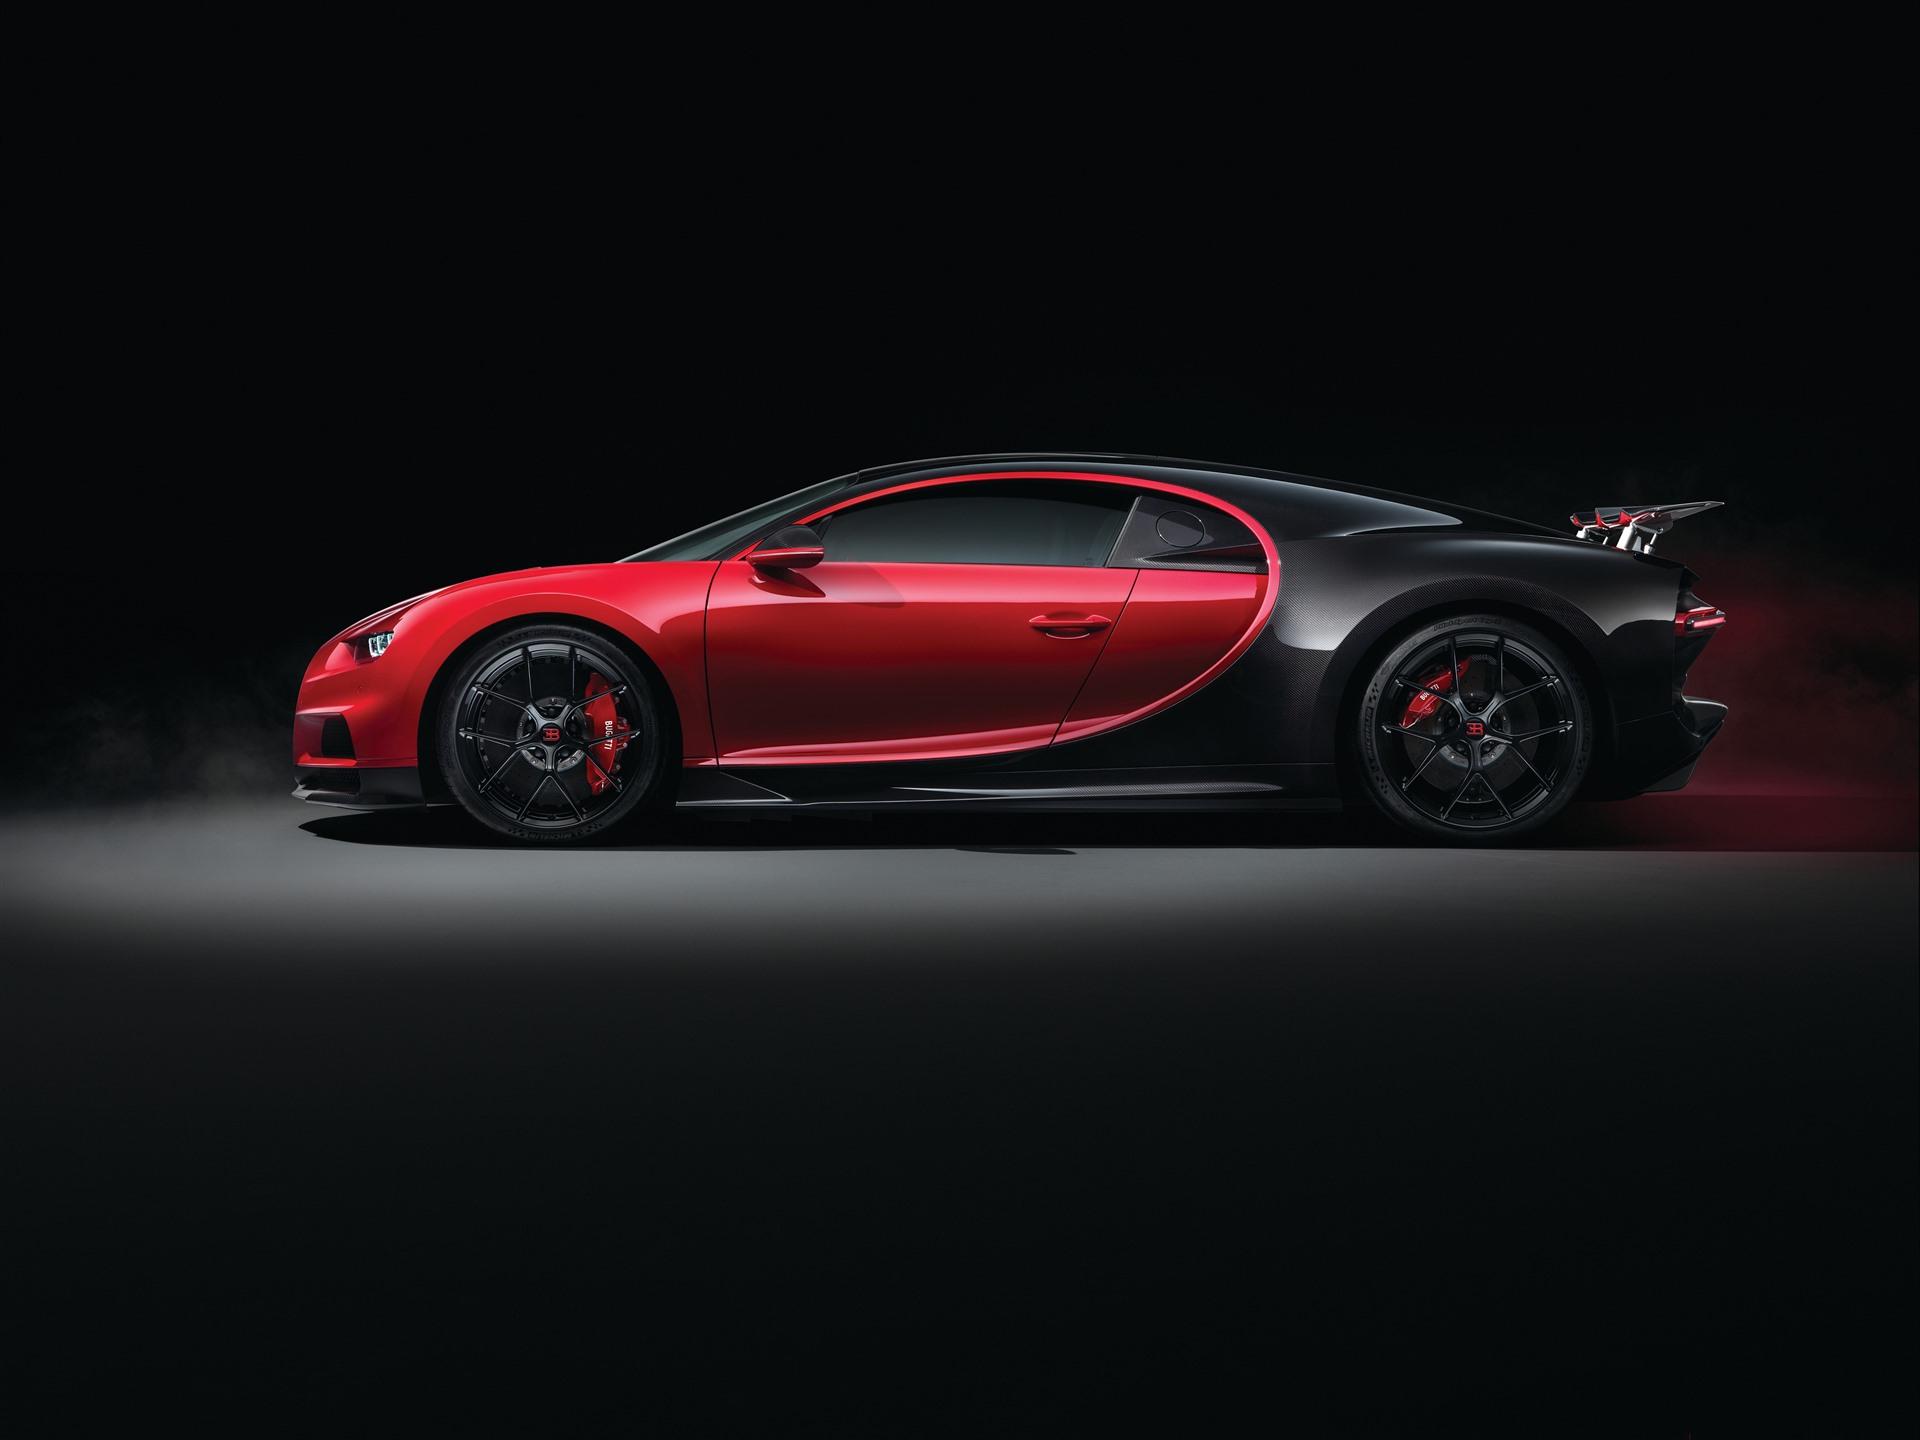 Wallpaper Bugatti Chiron 2018 supercar side view 3840x2160 ...